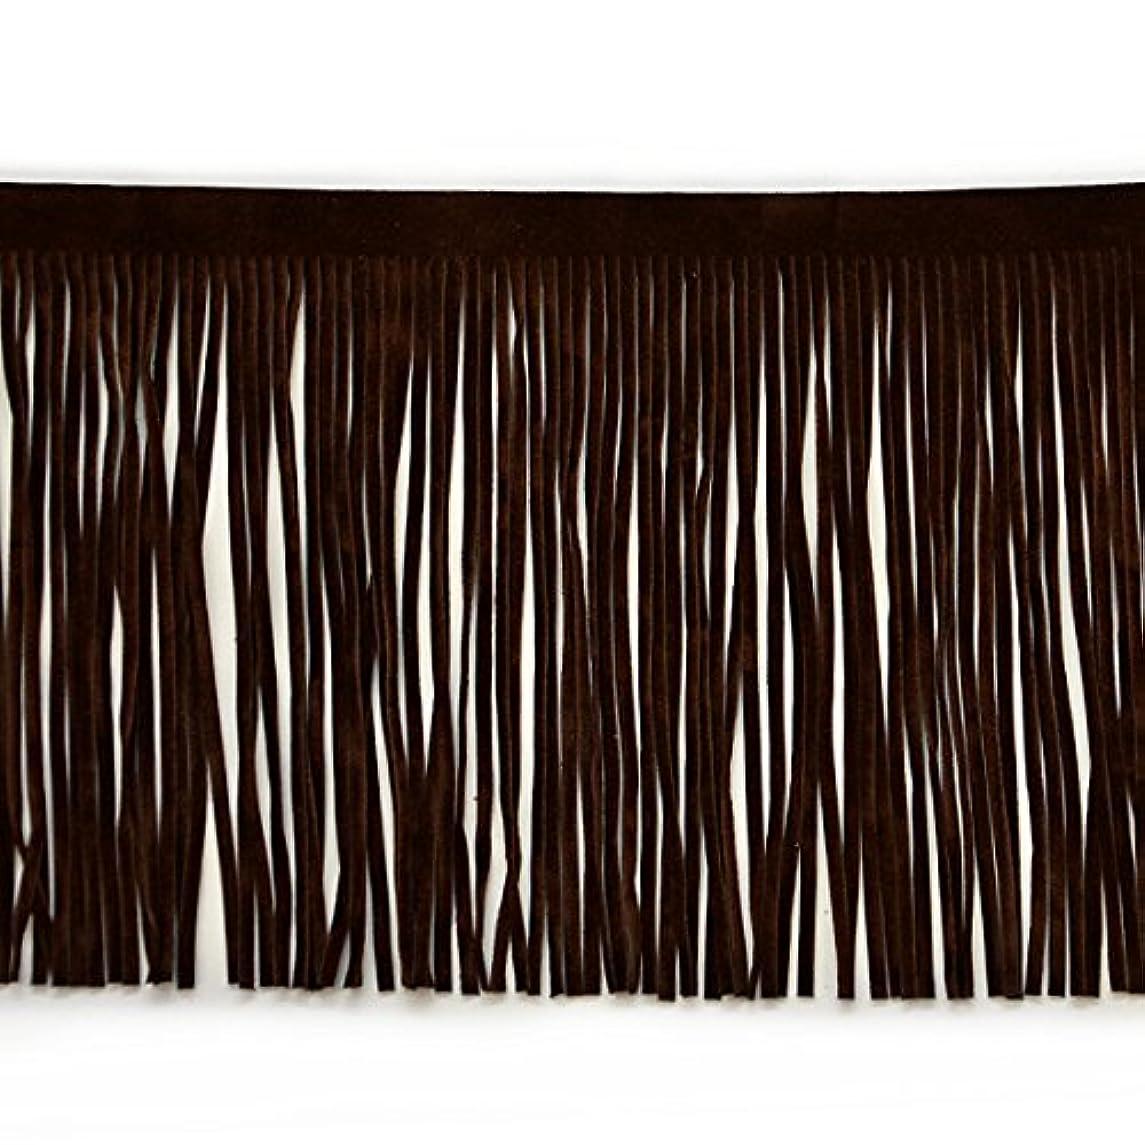 Expo International 4-Inch Faux Suede Fringe Trim Embellishment, 10-Yard, Brown